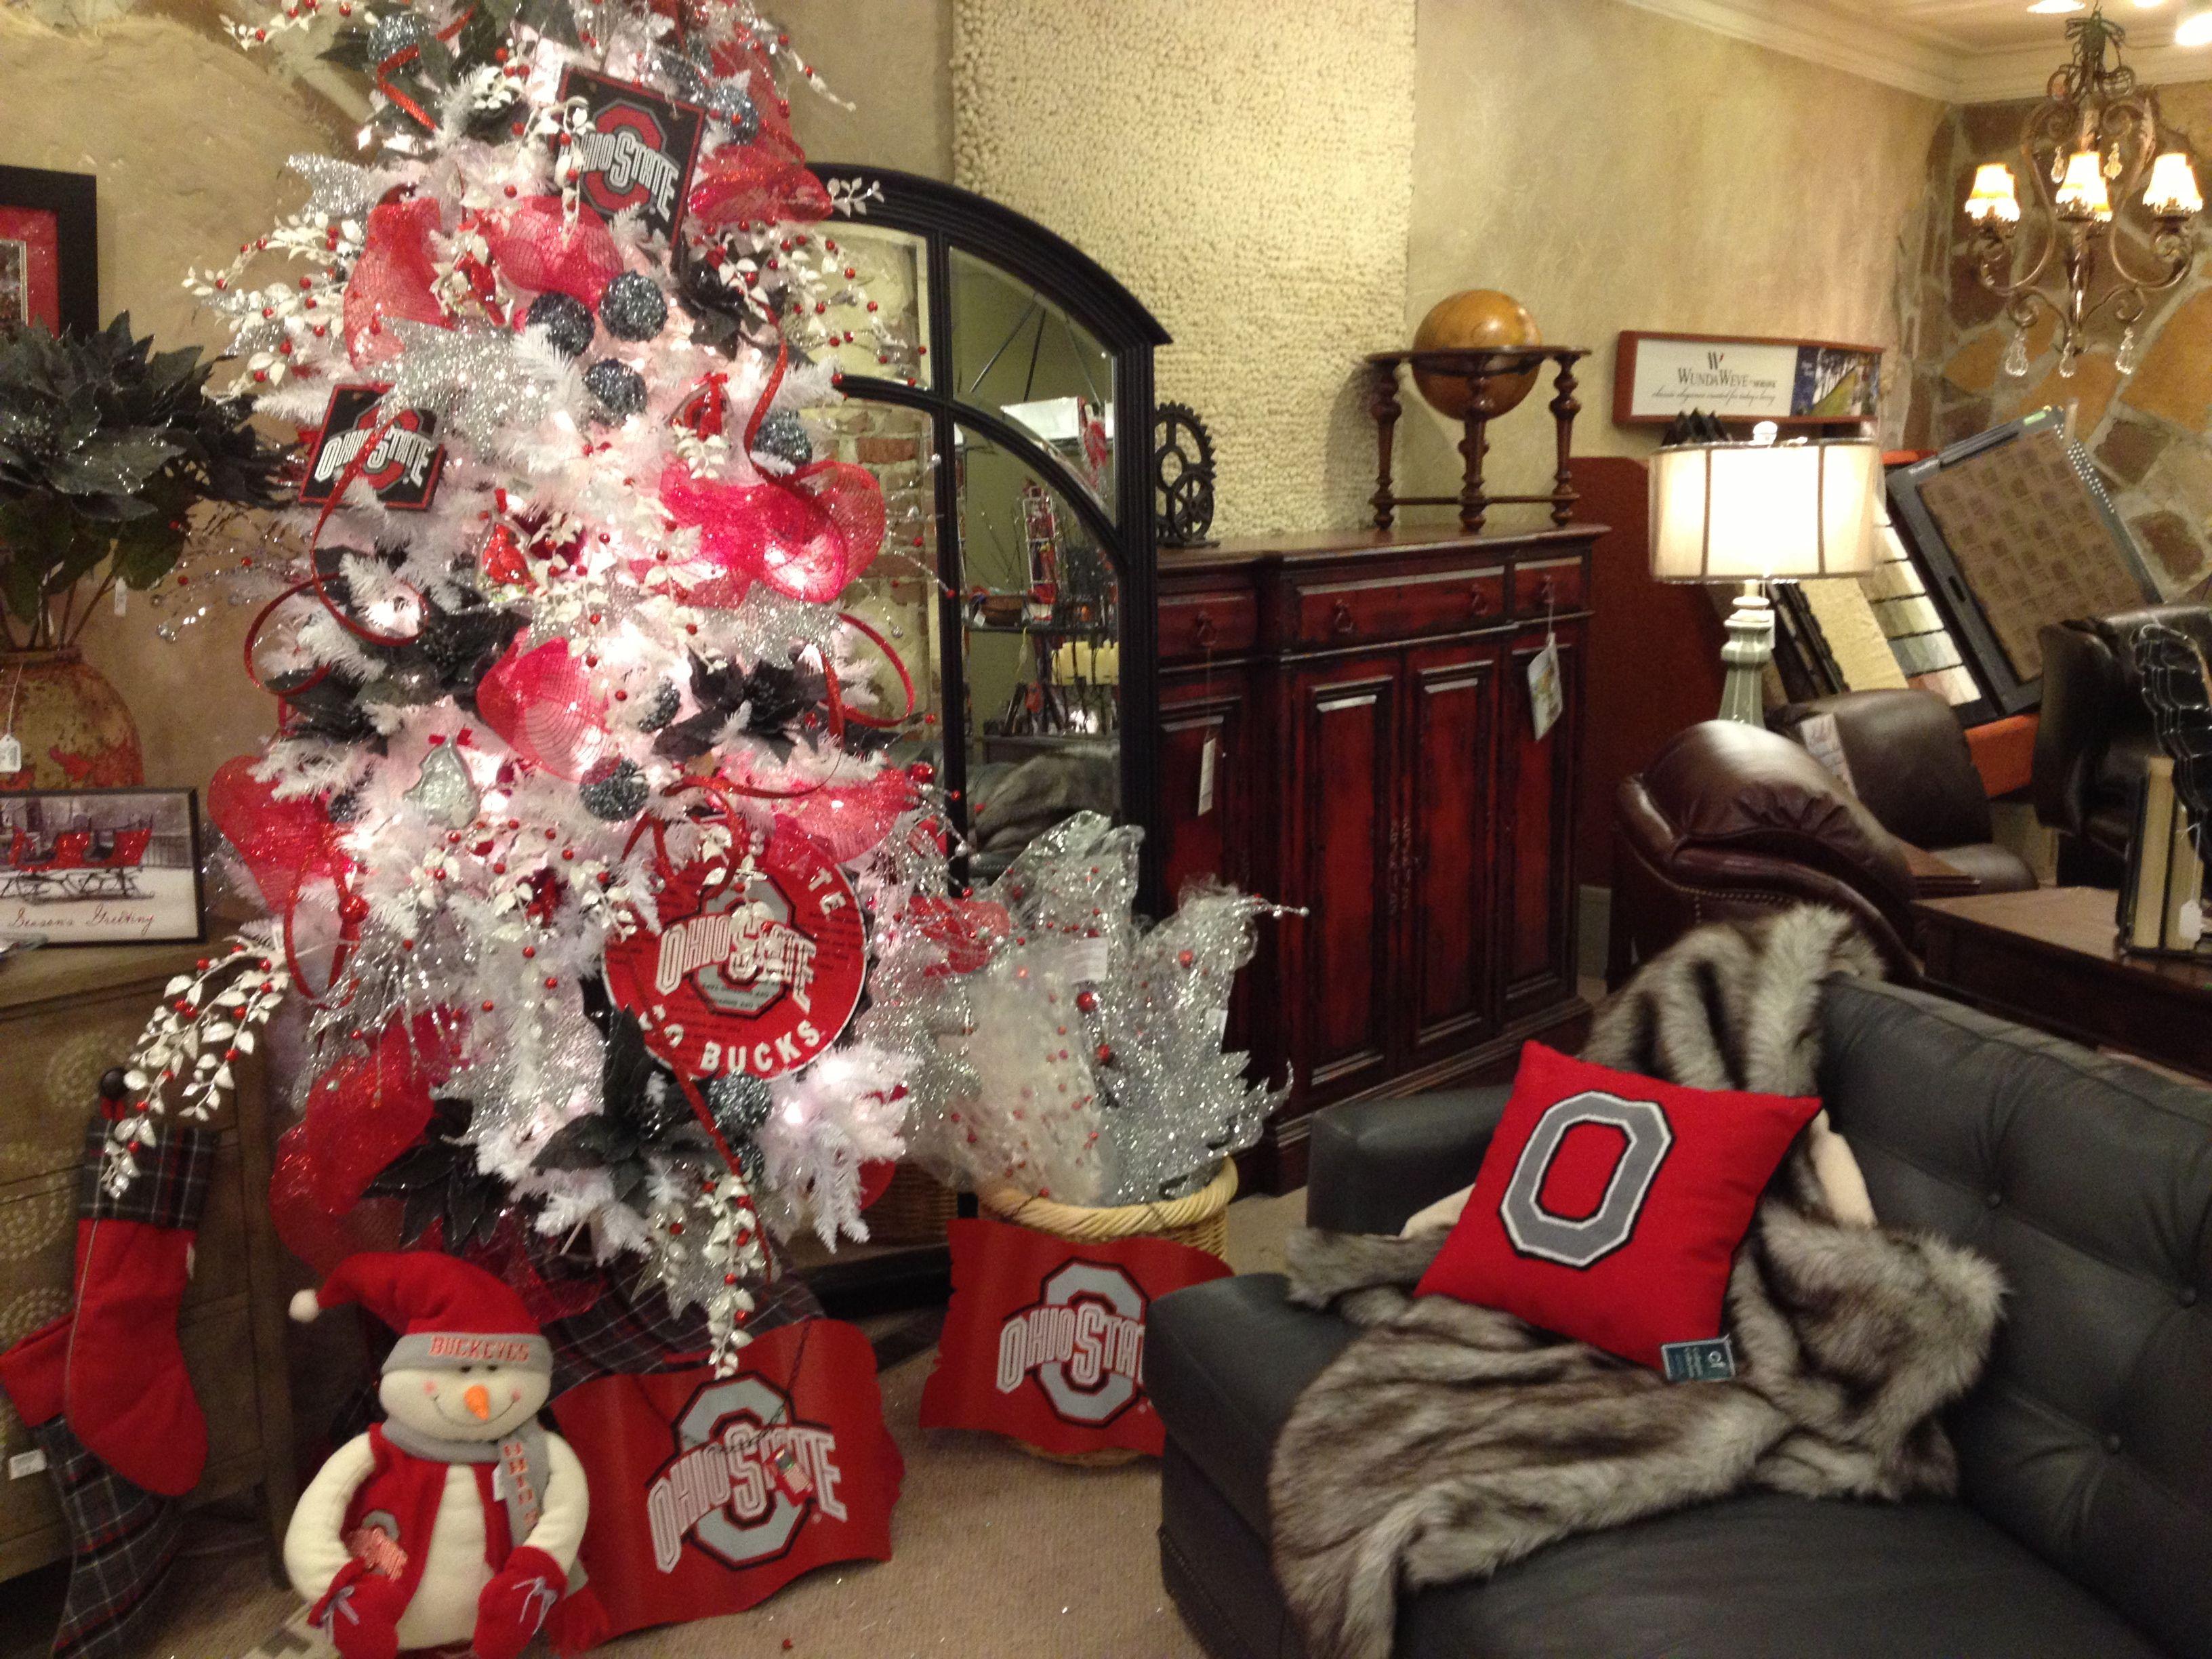 Decorate the christmas tree fa la la la - Ohio State Christmas Tree And Decor